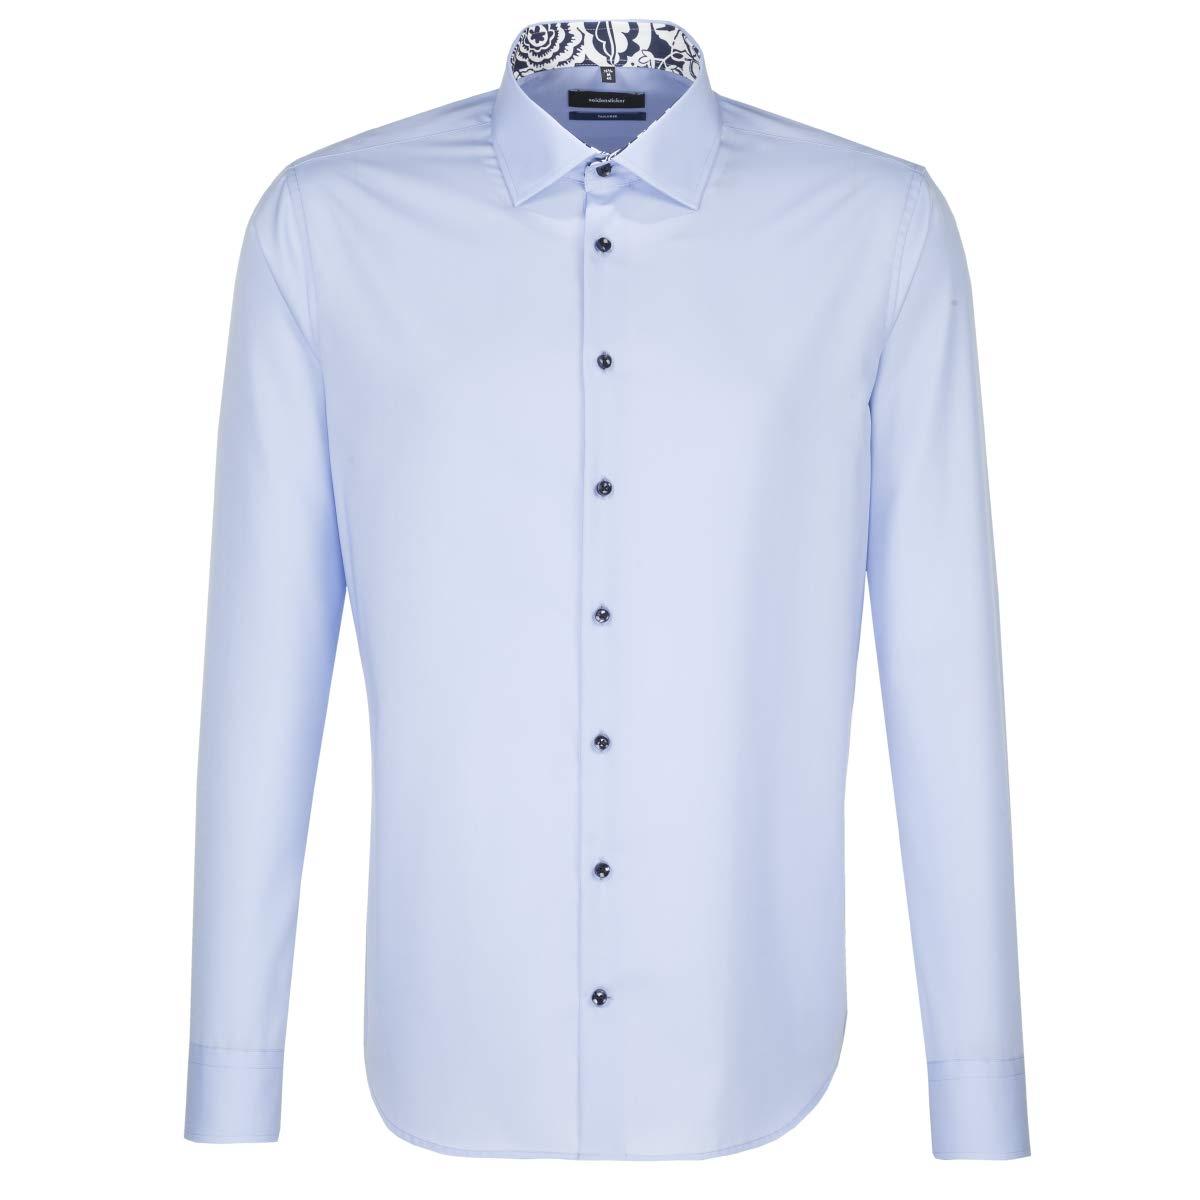 TALLA 41. Seidensticker - Camisa Formal - Liso - Clásico - para Hombre